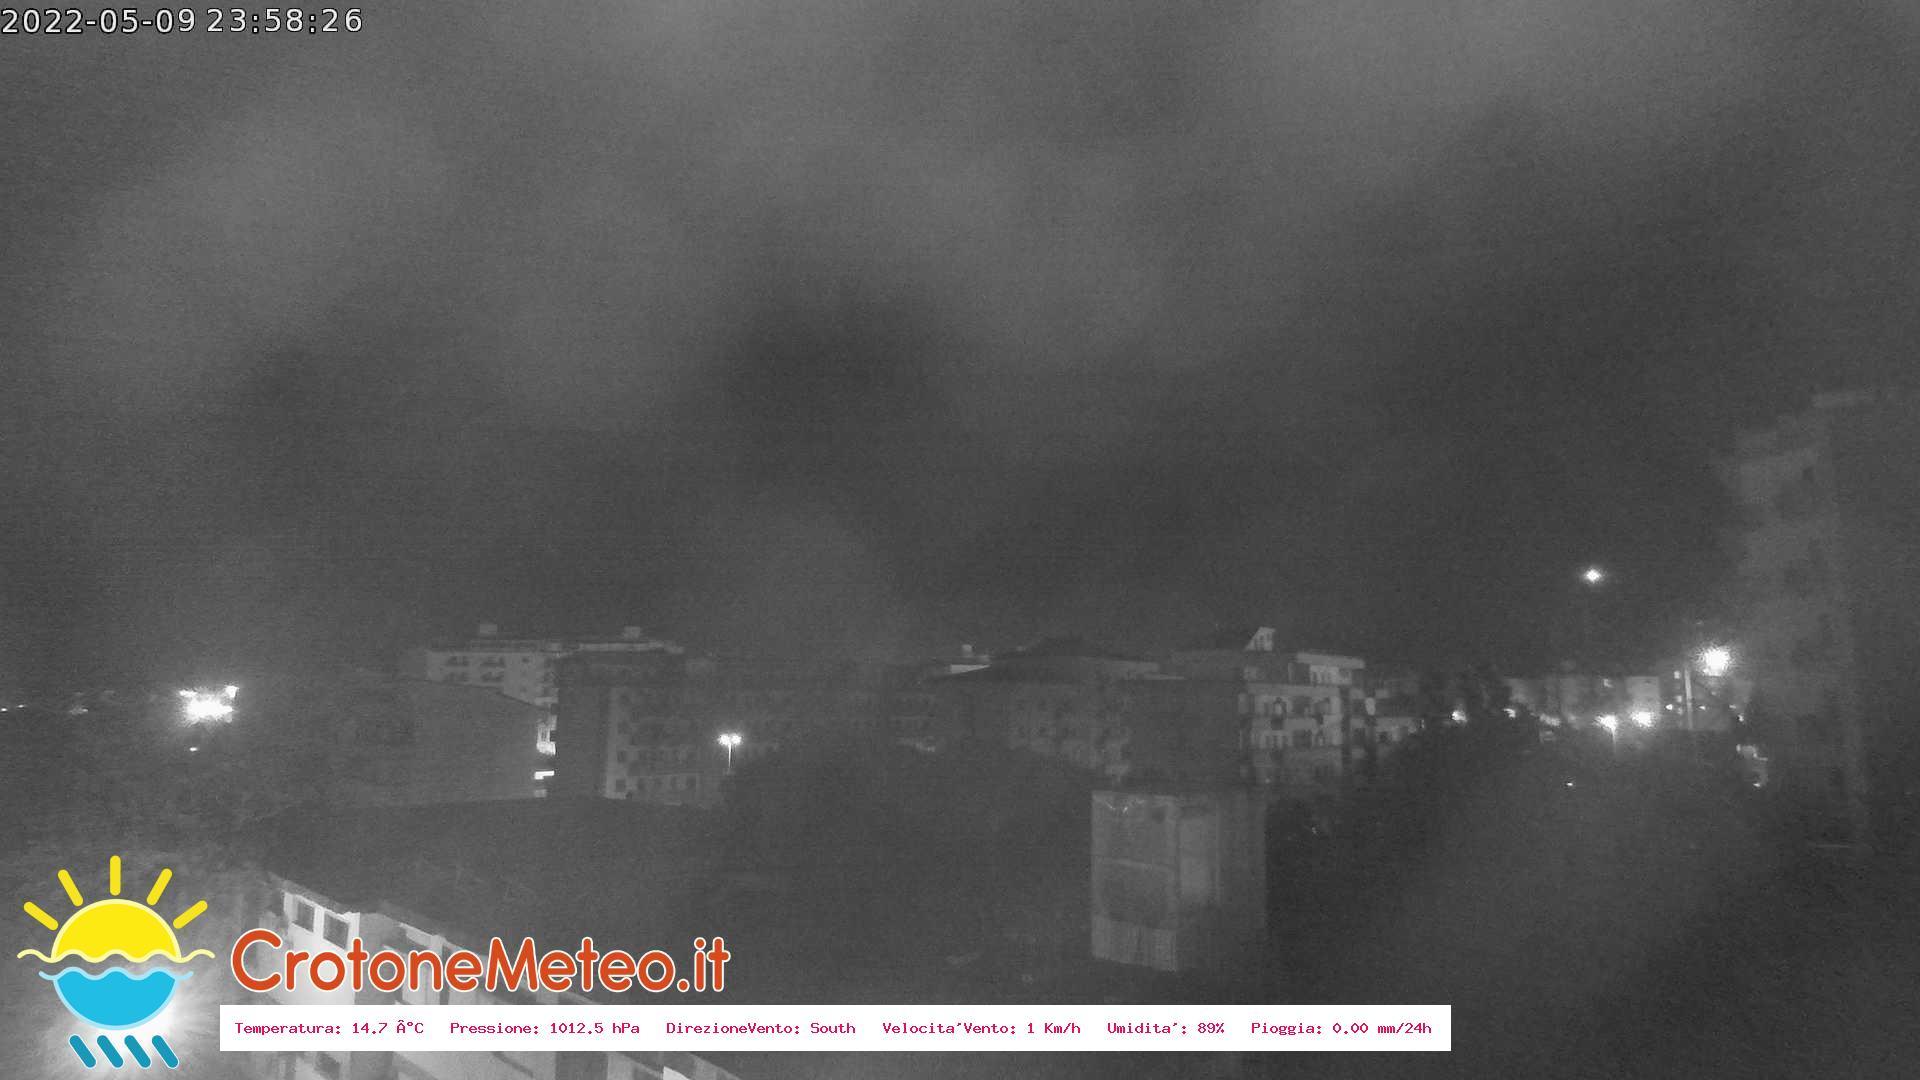 Webcam di Crotone